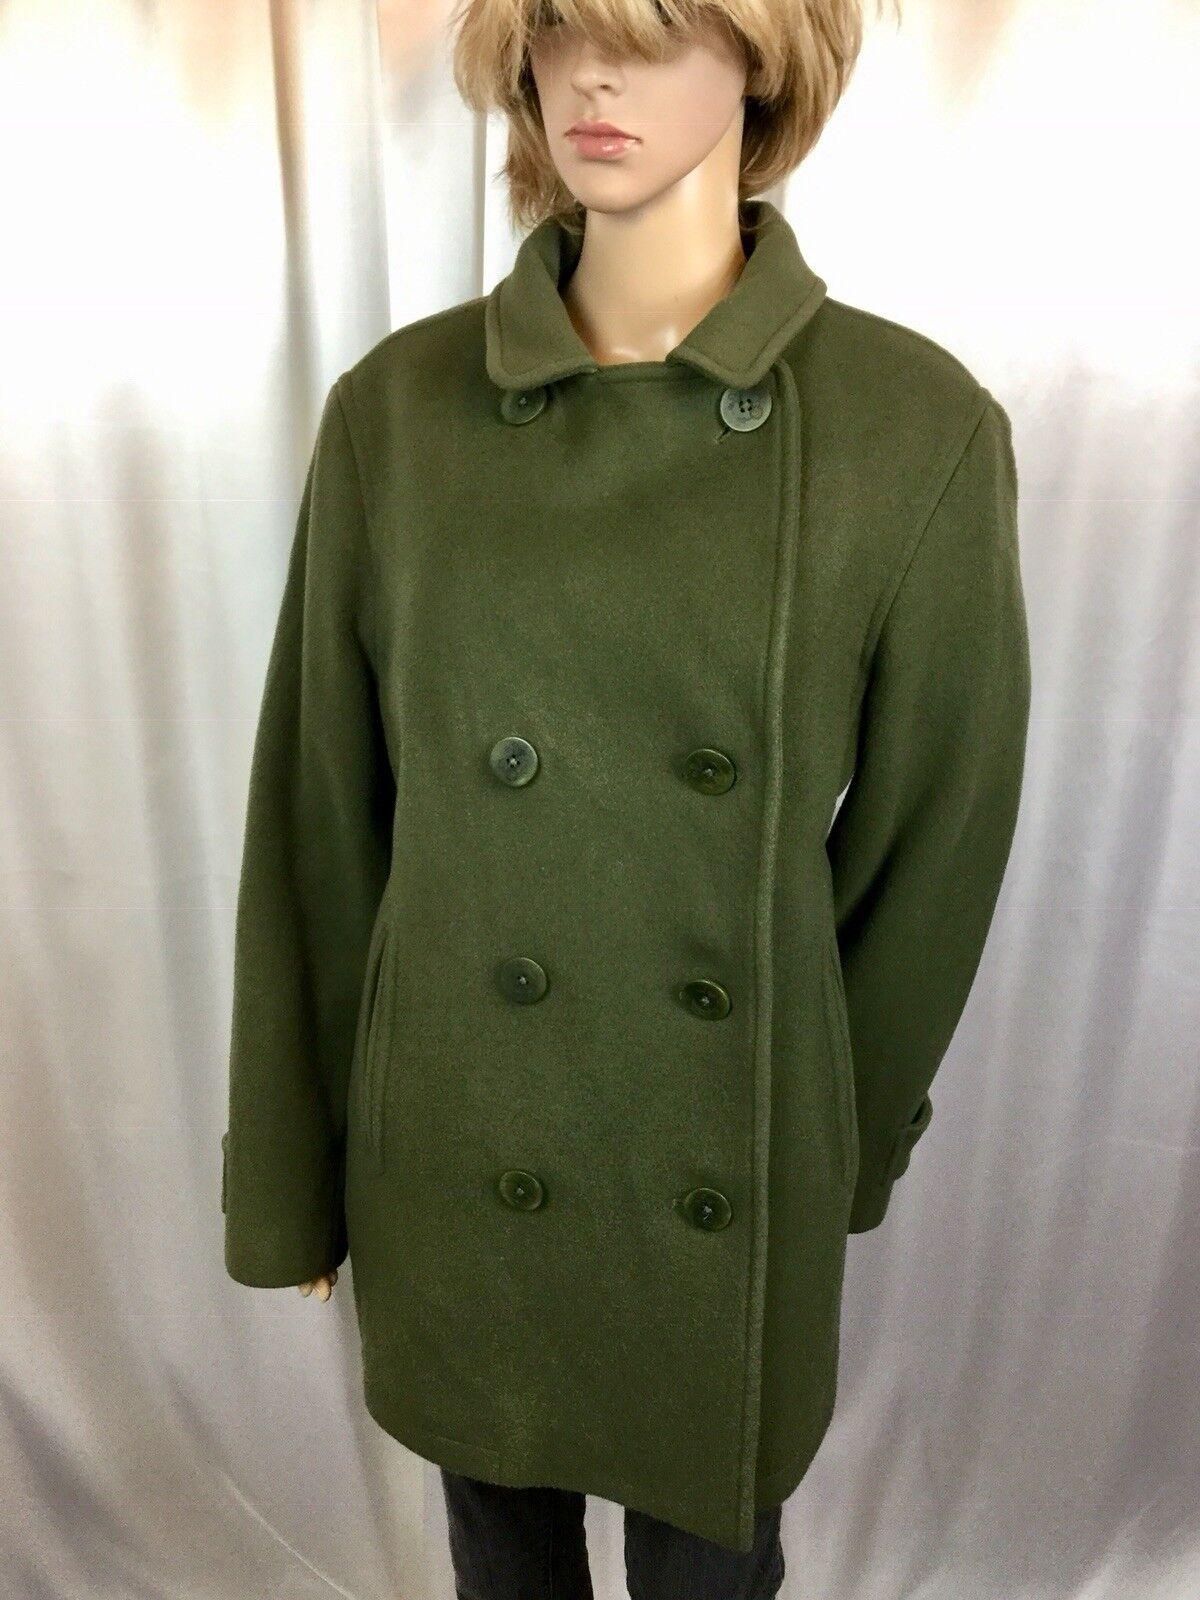 Rare LL BEAN 100% WOOL BELLANDI ITALY Olive Green peacoat overcoat 1X XL